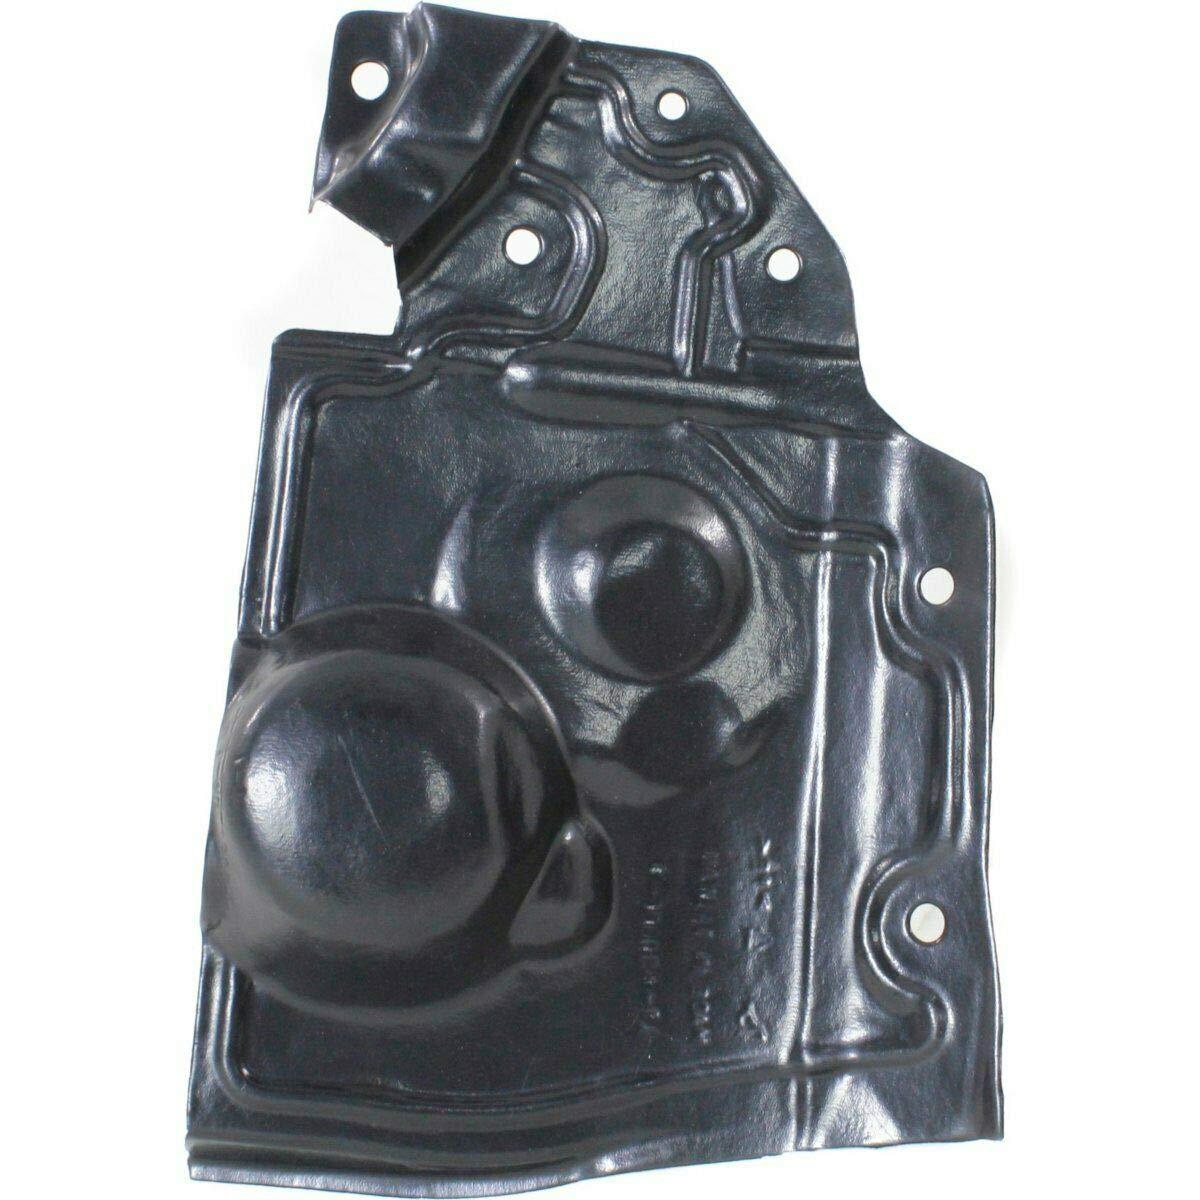 KA LEGEND Engine Under Cover Splash Shield Guard Front Right for 2008-2012 Rogue 64838JG00A NI1228155